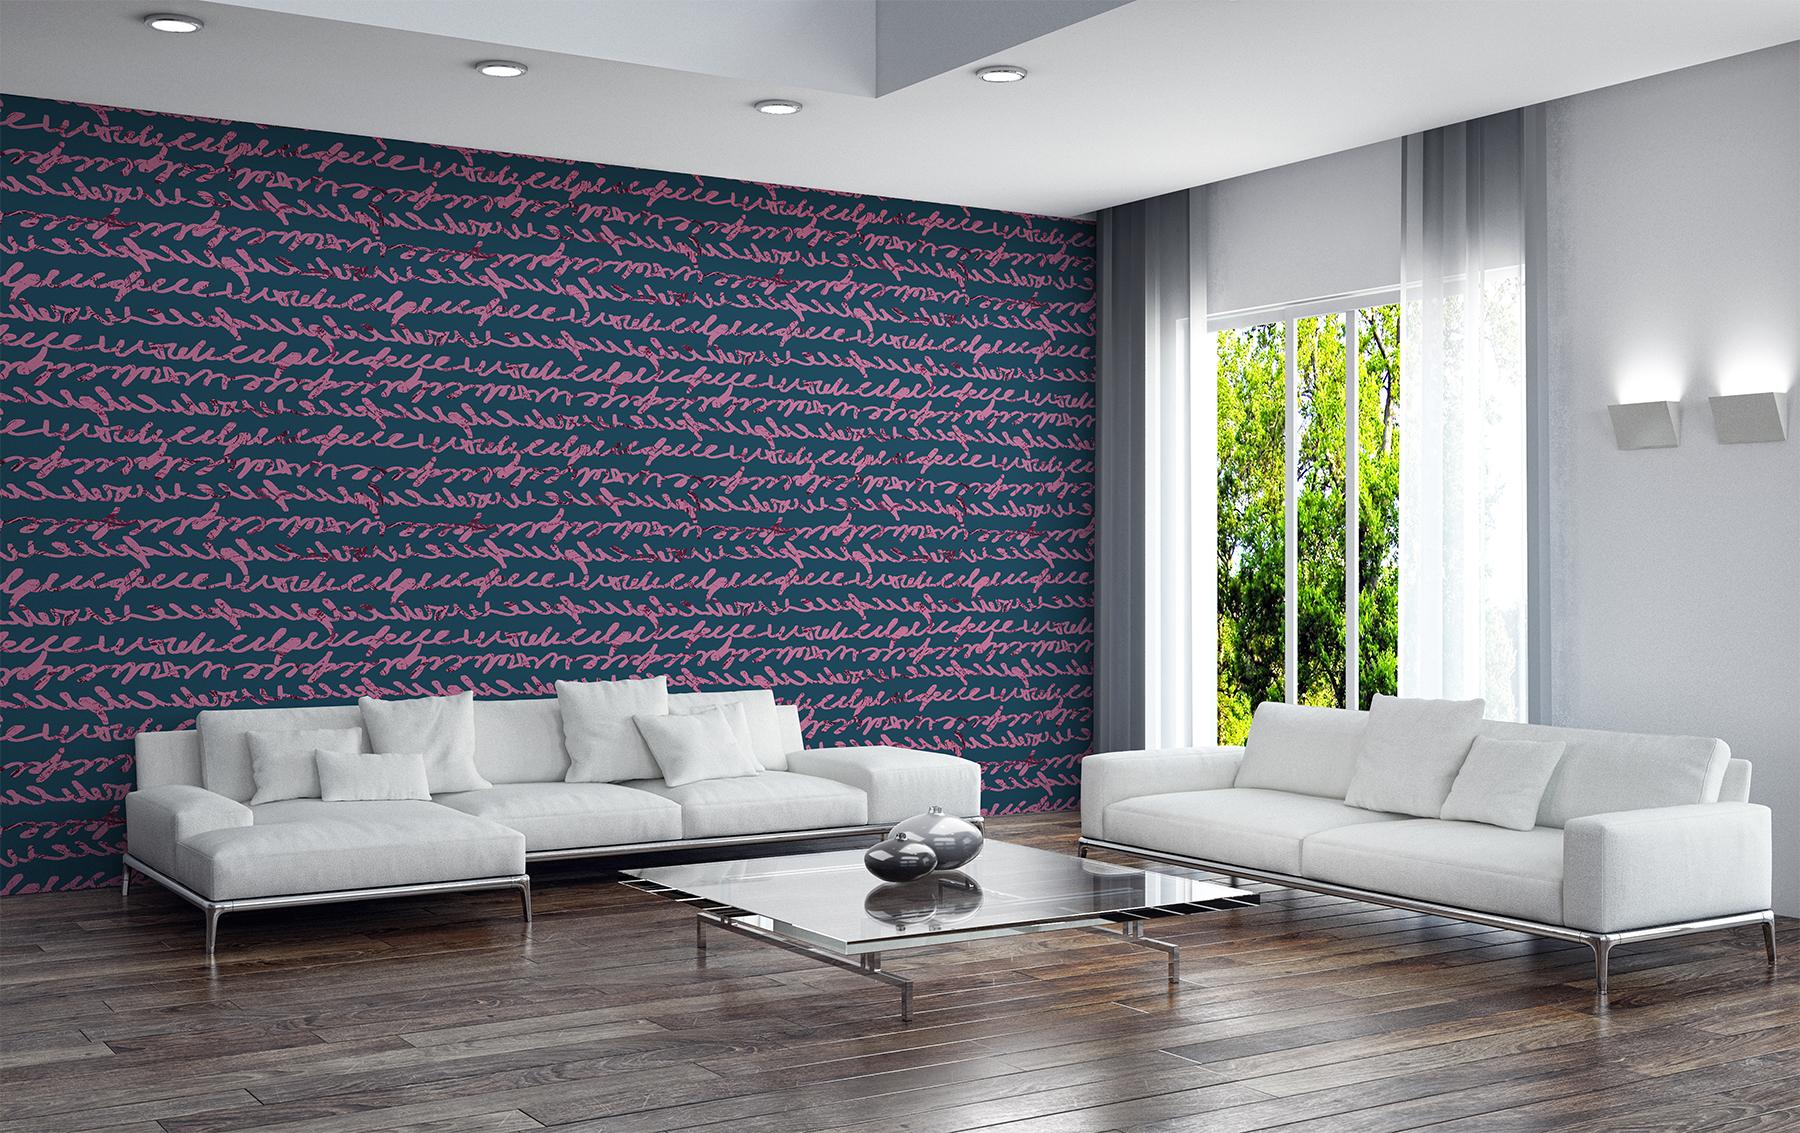 Wallpaper featuring Signature Stripe